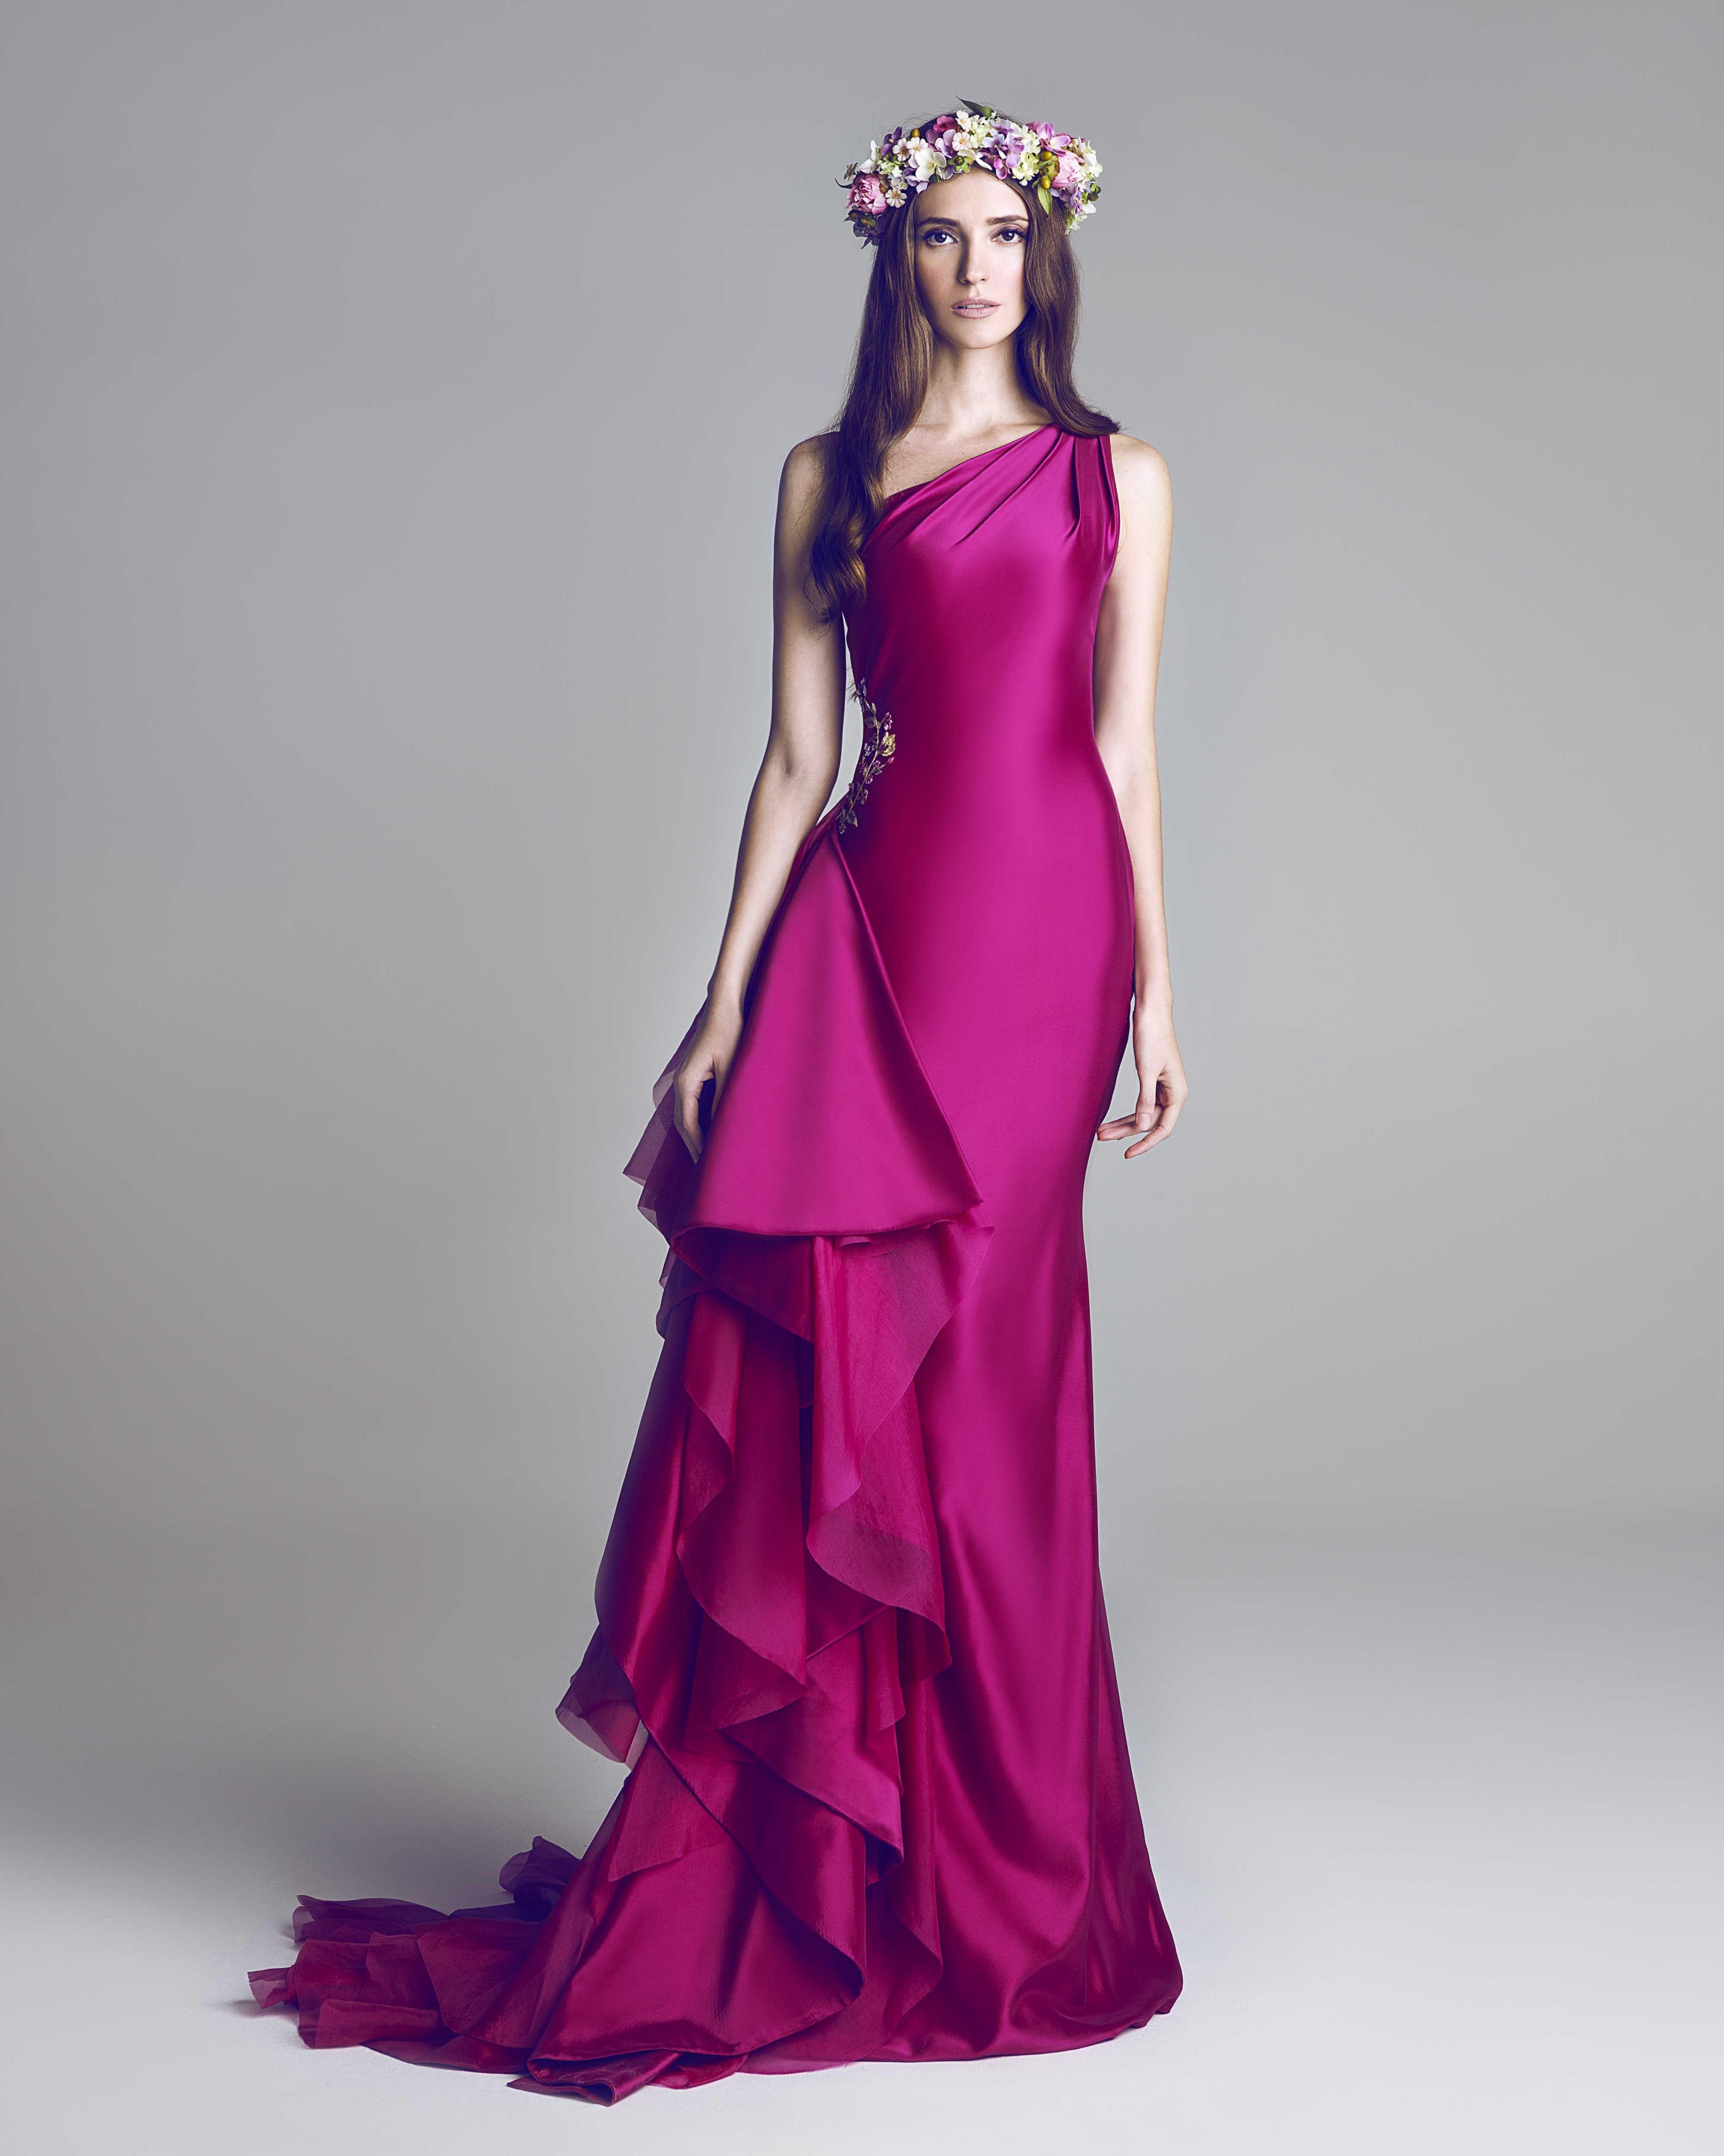 Fuchsia taffeta dress | Spring Summer 2013 | Pinterest